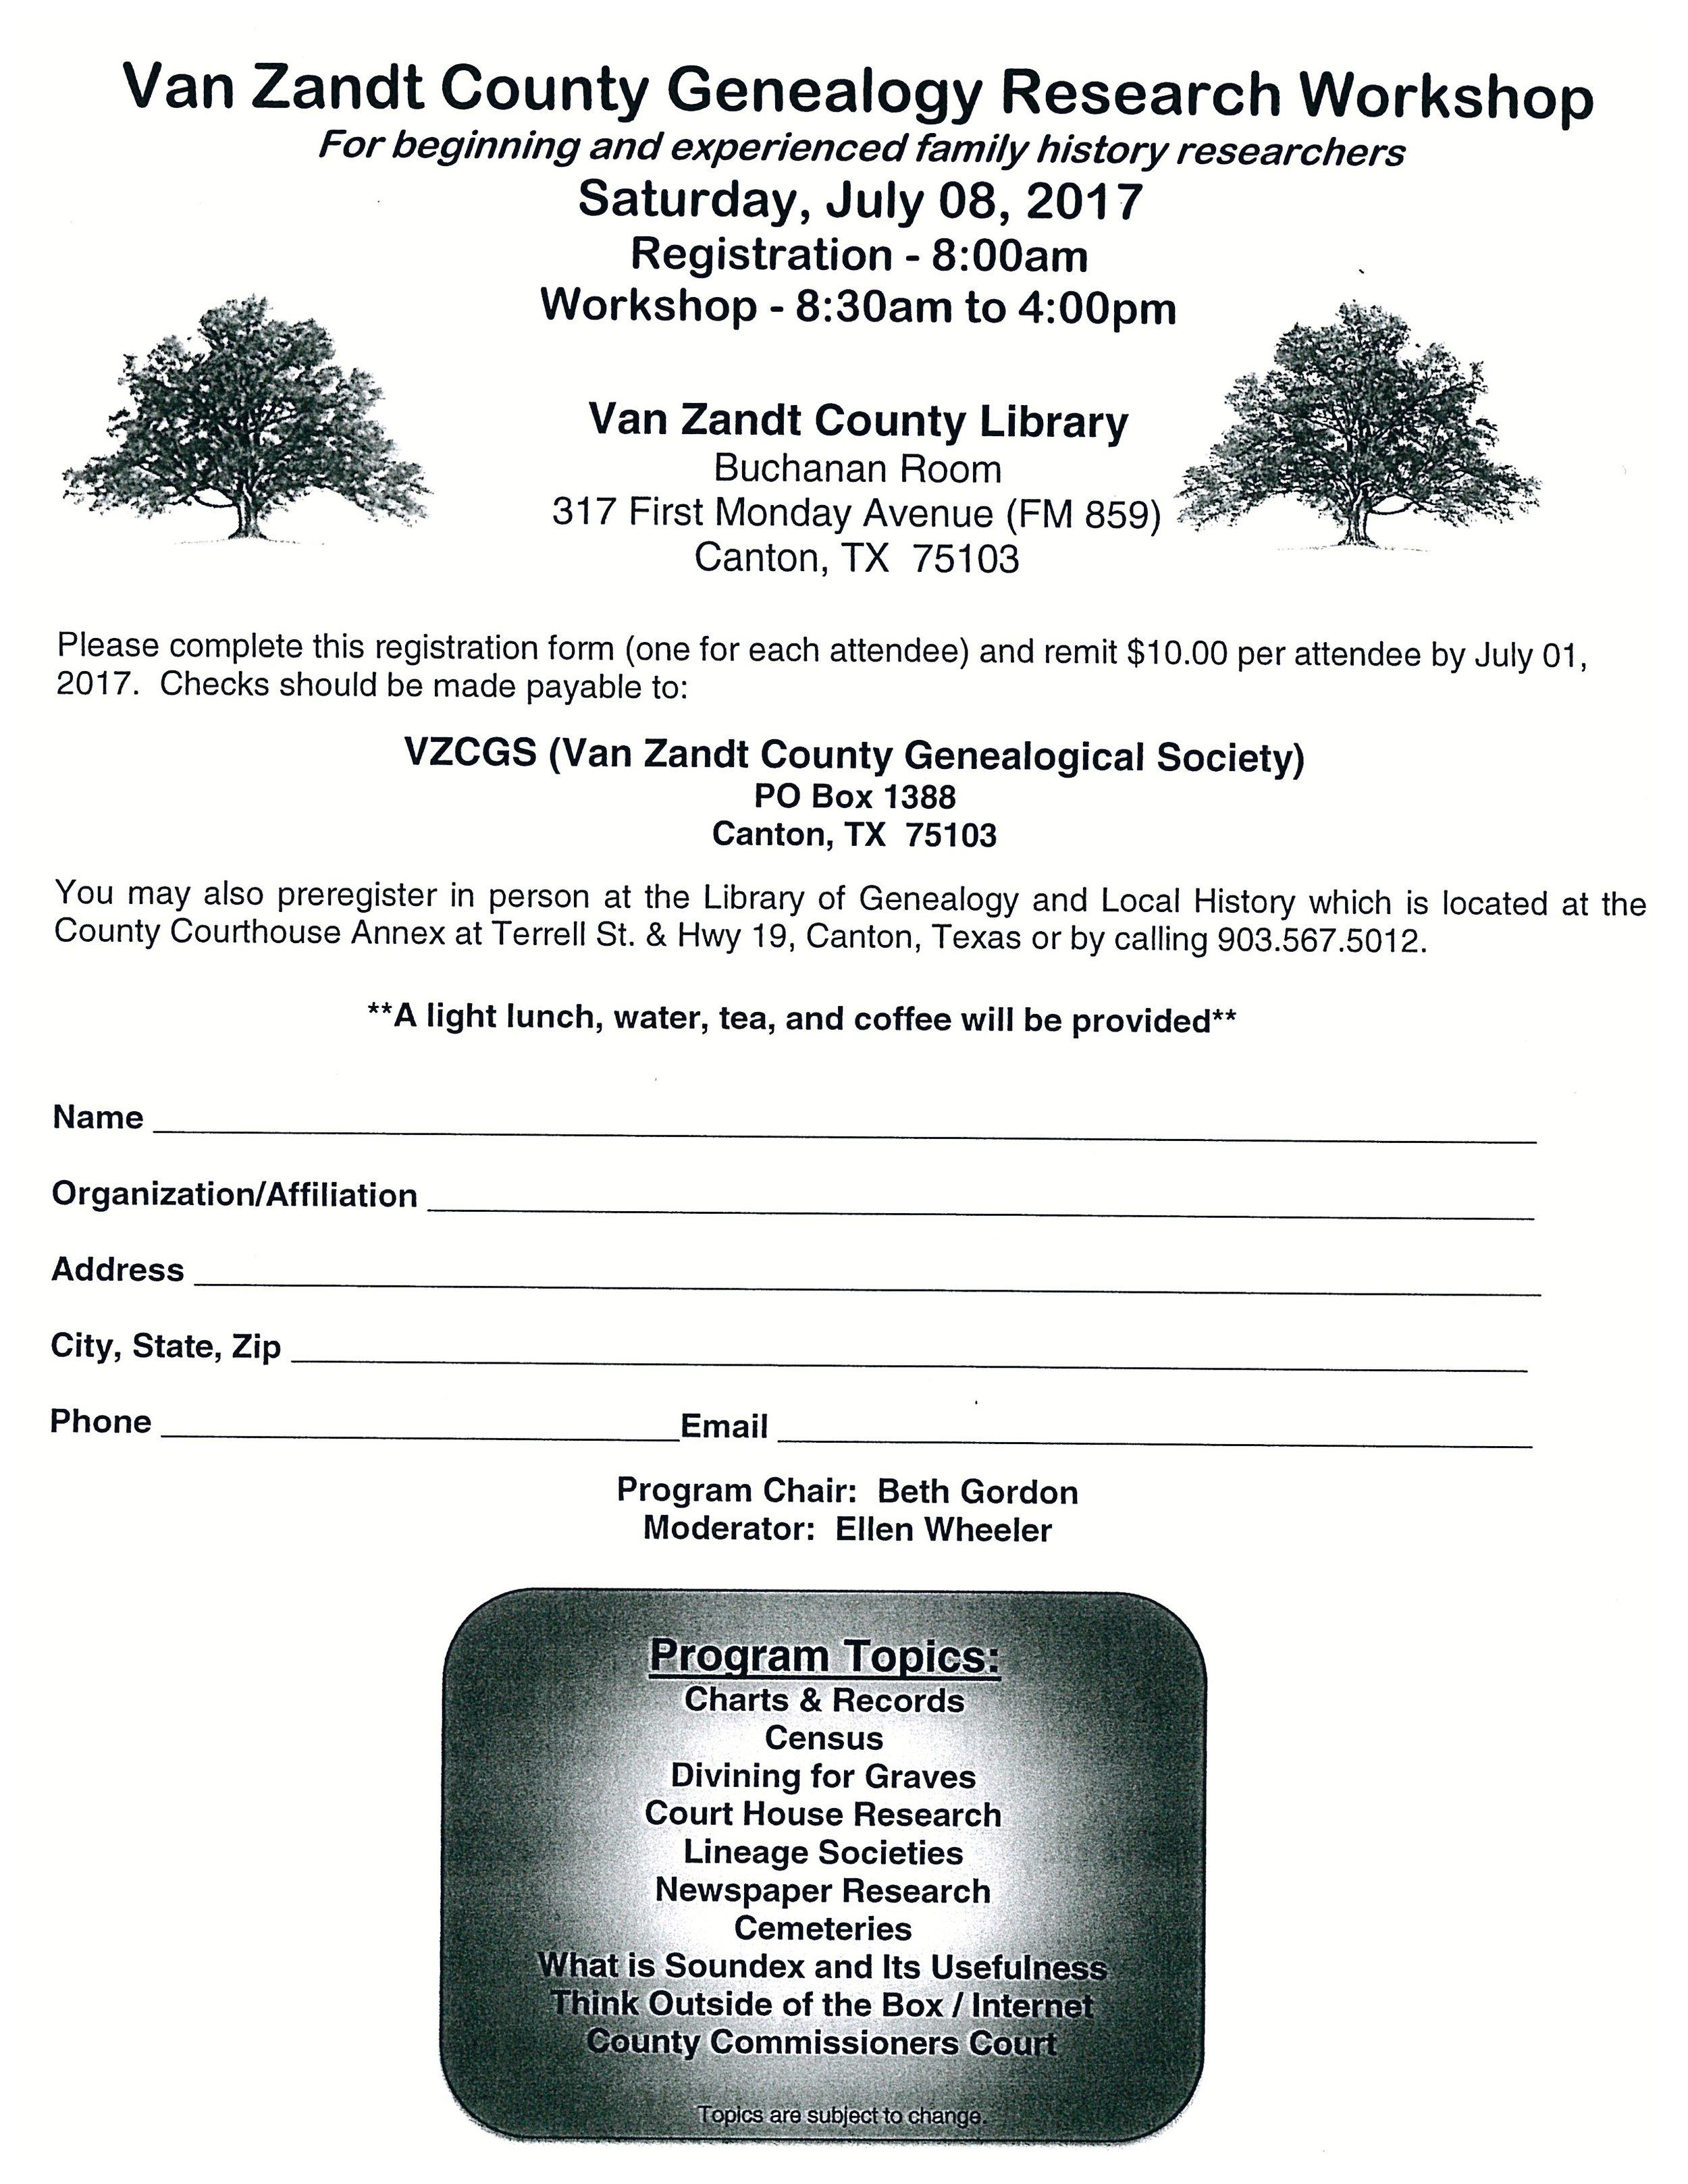 VZC Genealogy Research Workshop.jpg